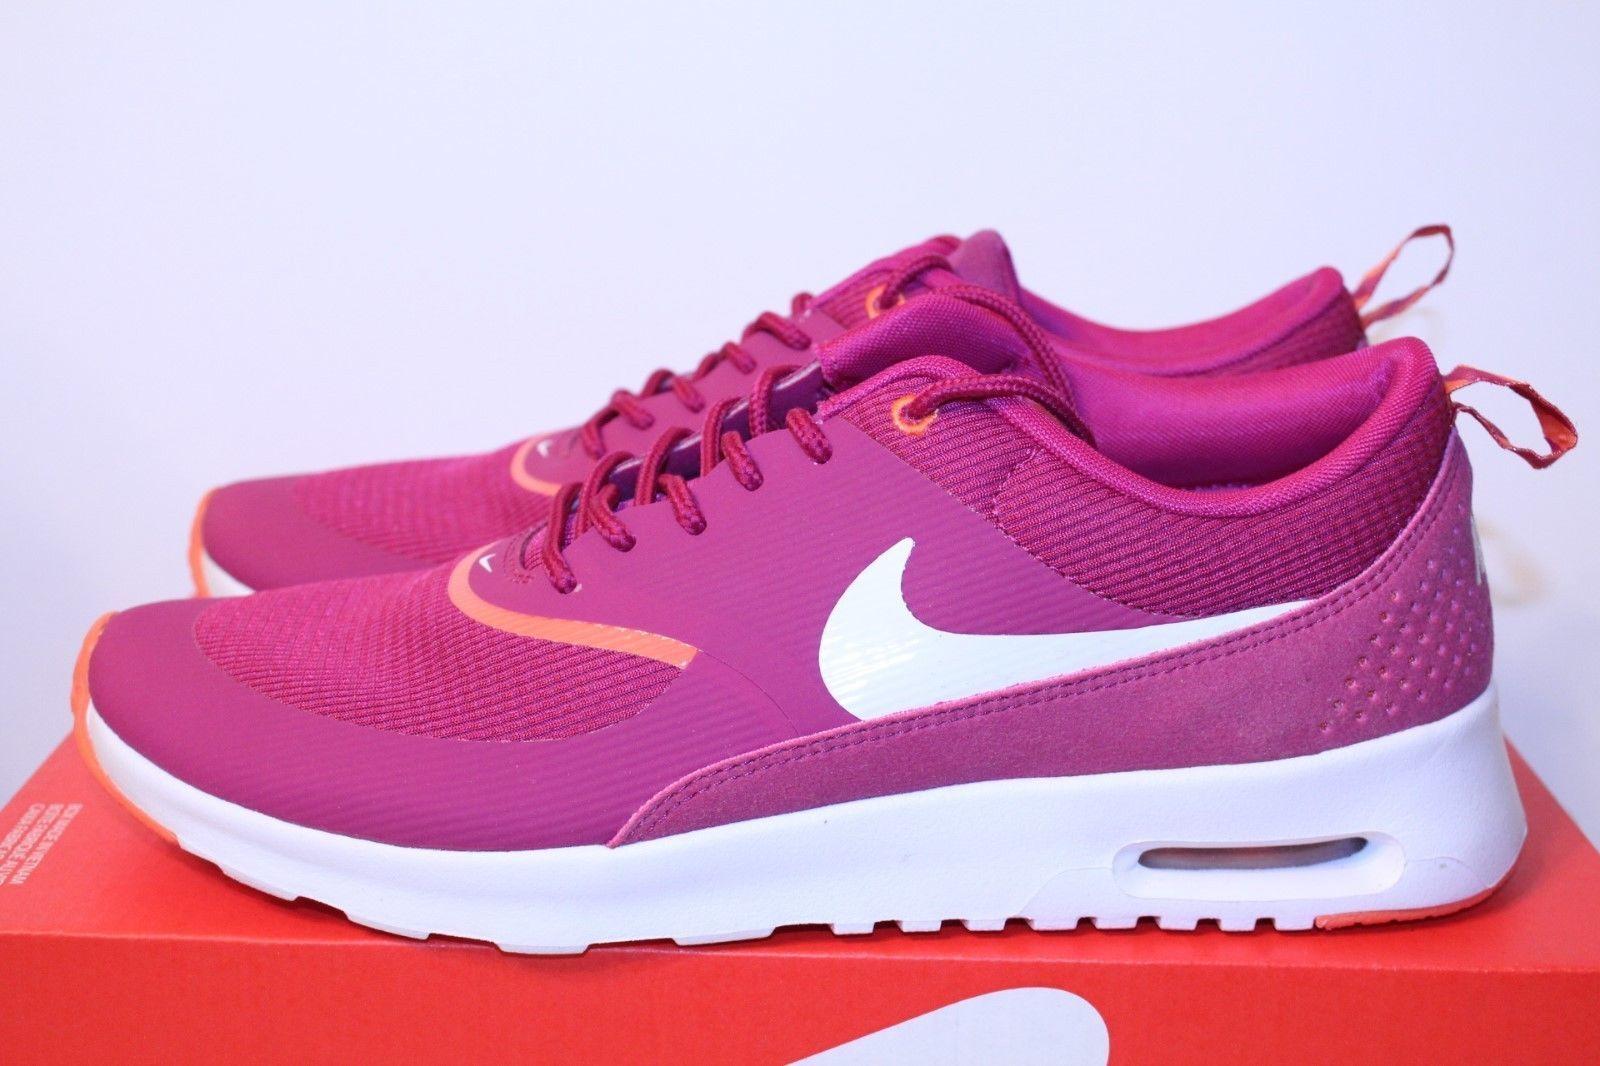 NIB Nike Air Max Thea Bright Magenta Sneaker shoes 599409-501 Womens Sz 7 - 7.5